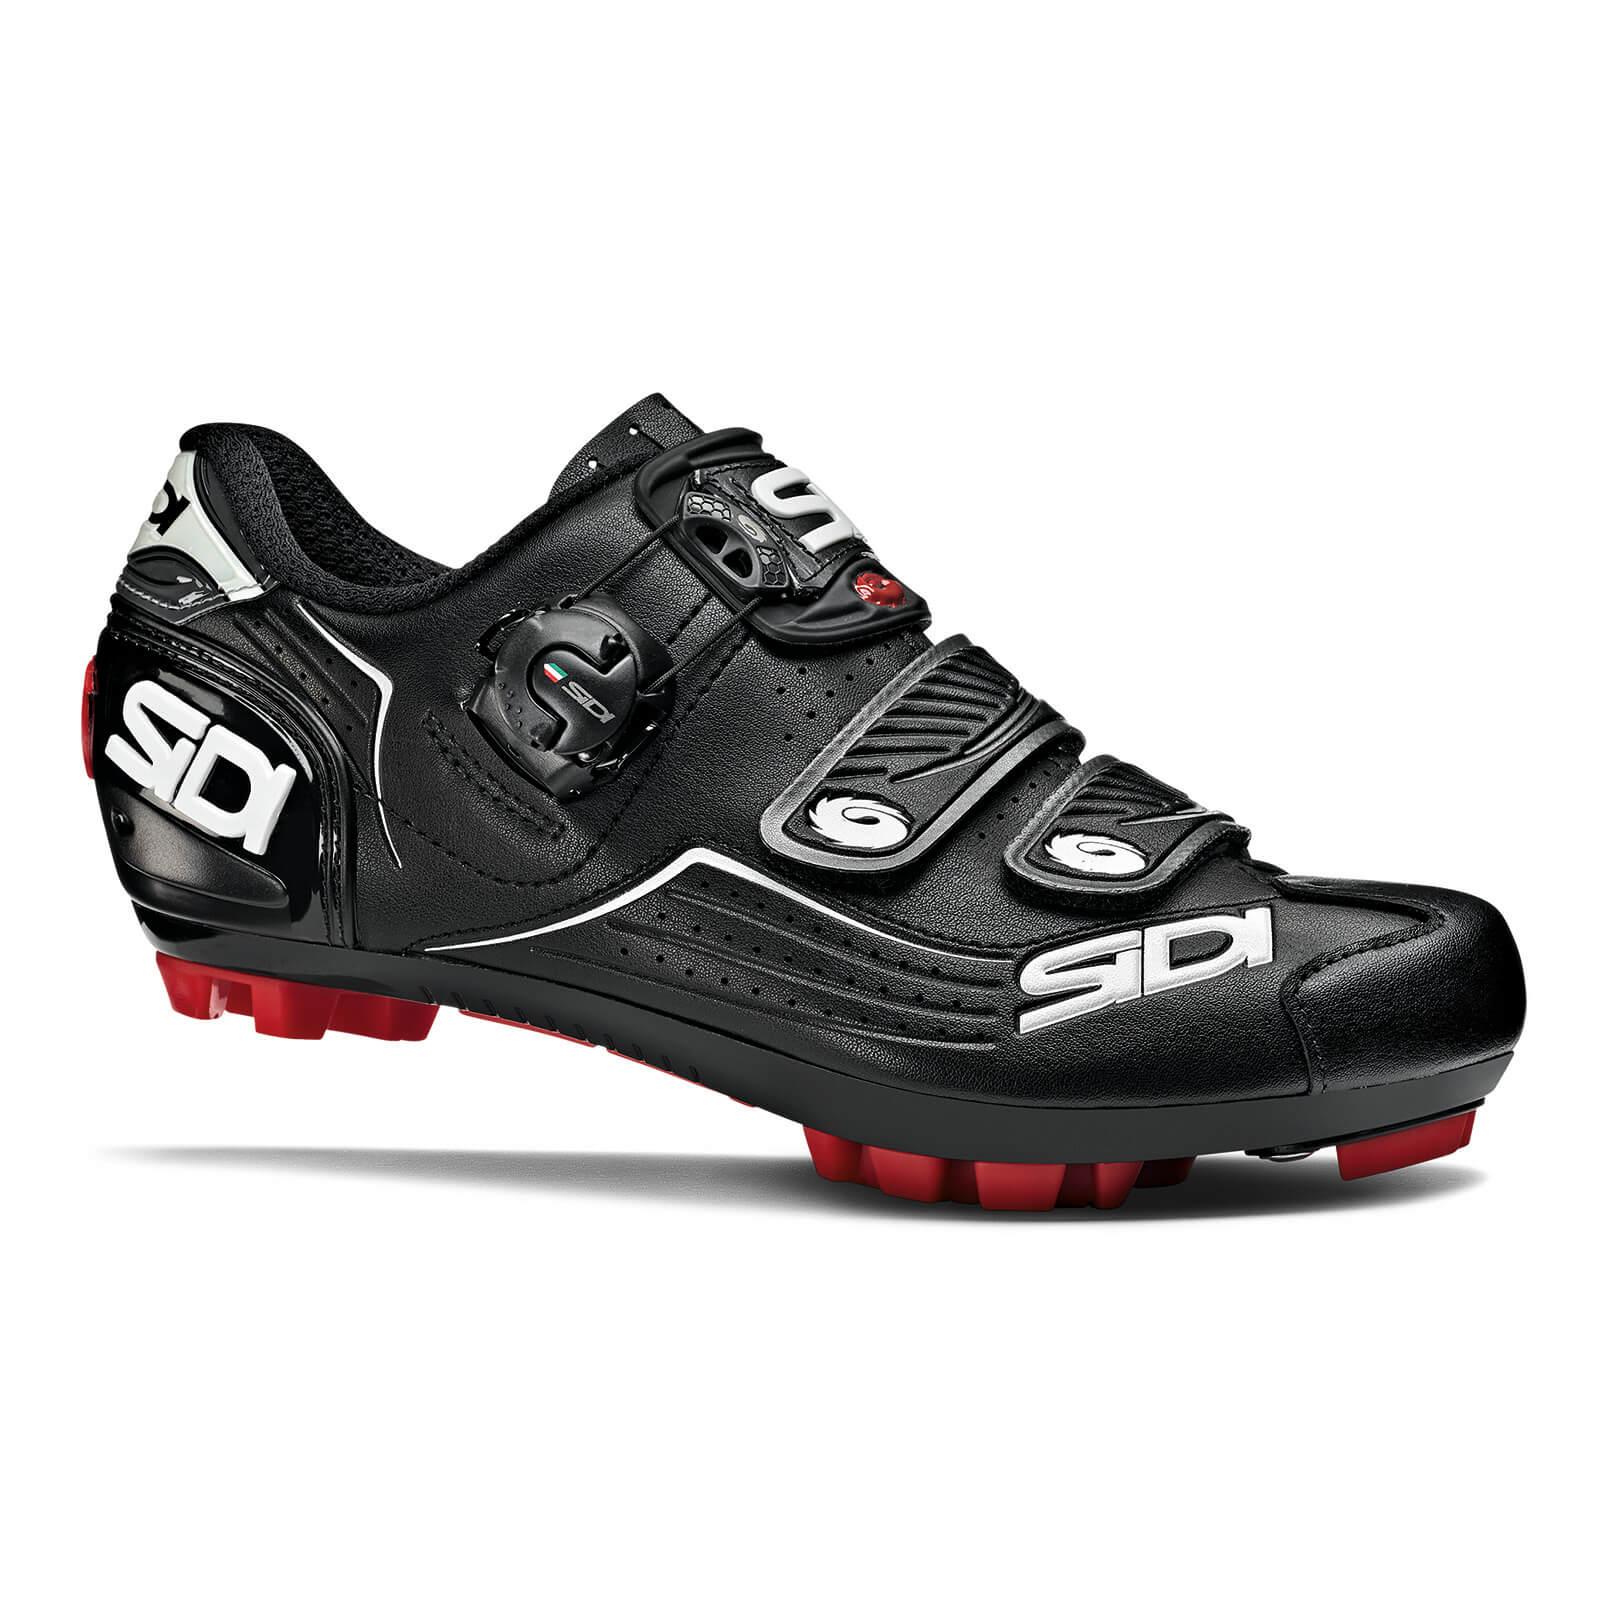 Sidi Women's Trace MTB Shoes - EU 41